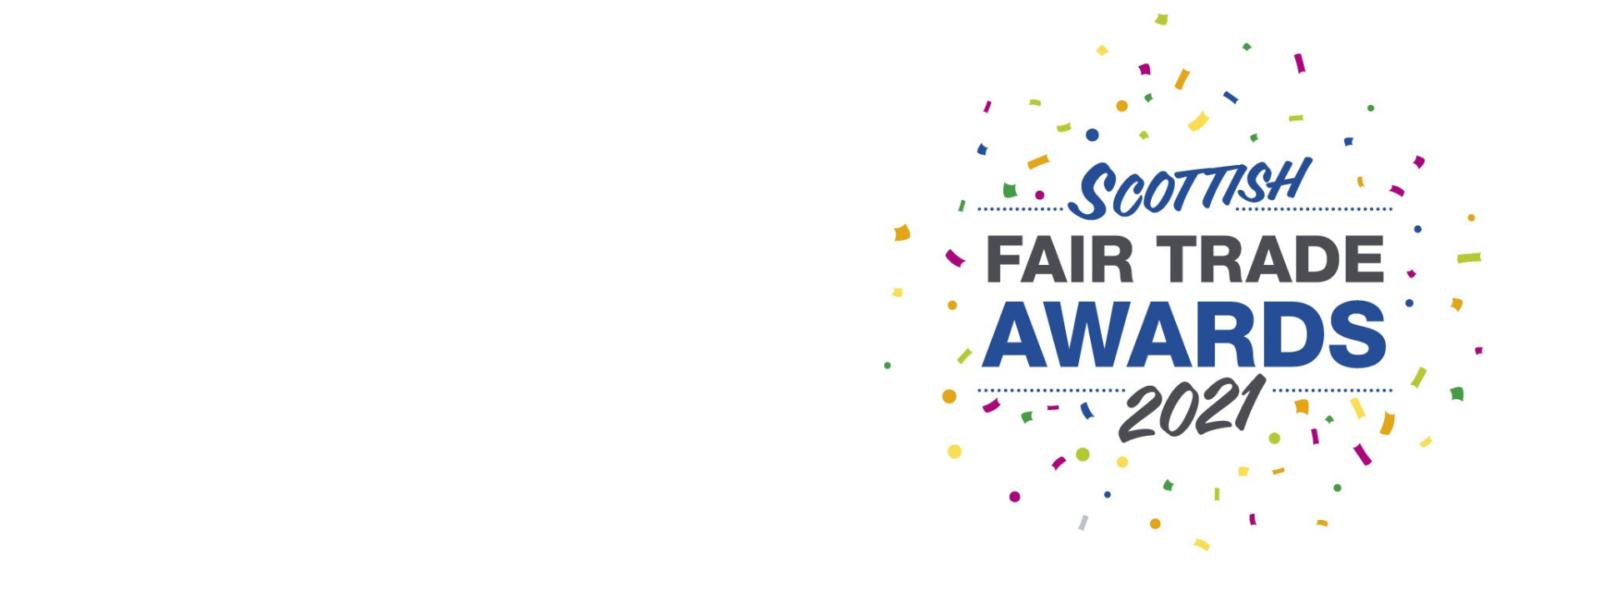 Logo with words Scottish Fair Trade Awards 2021